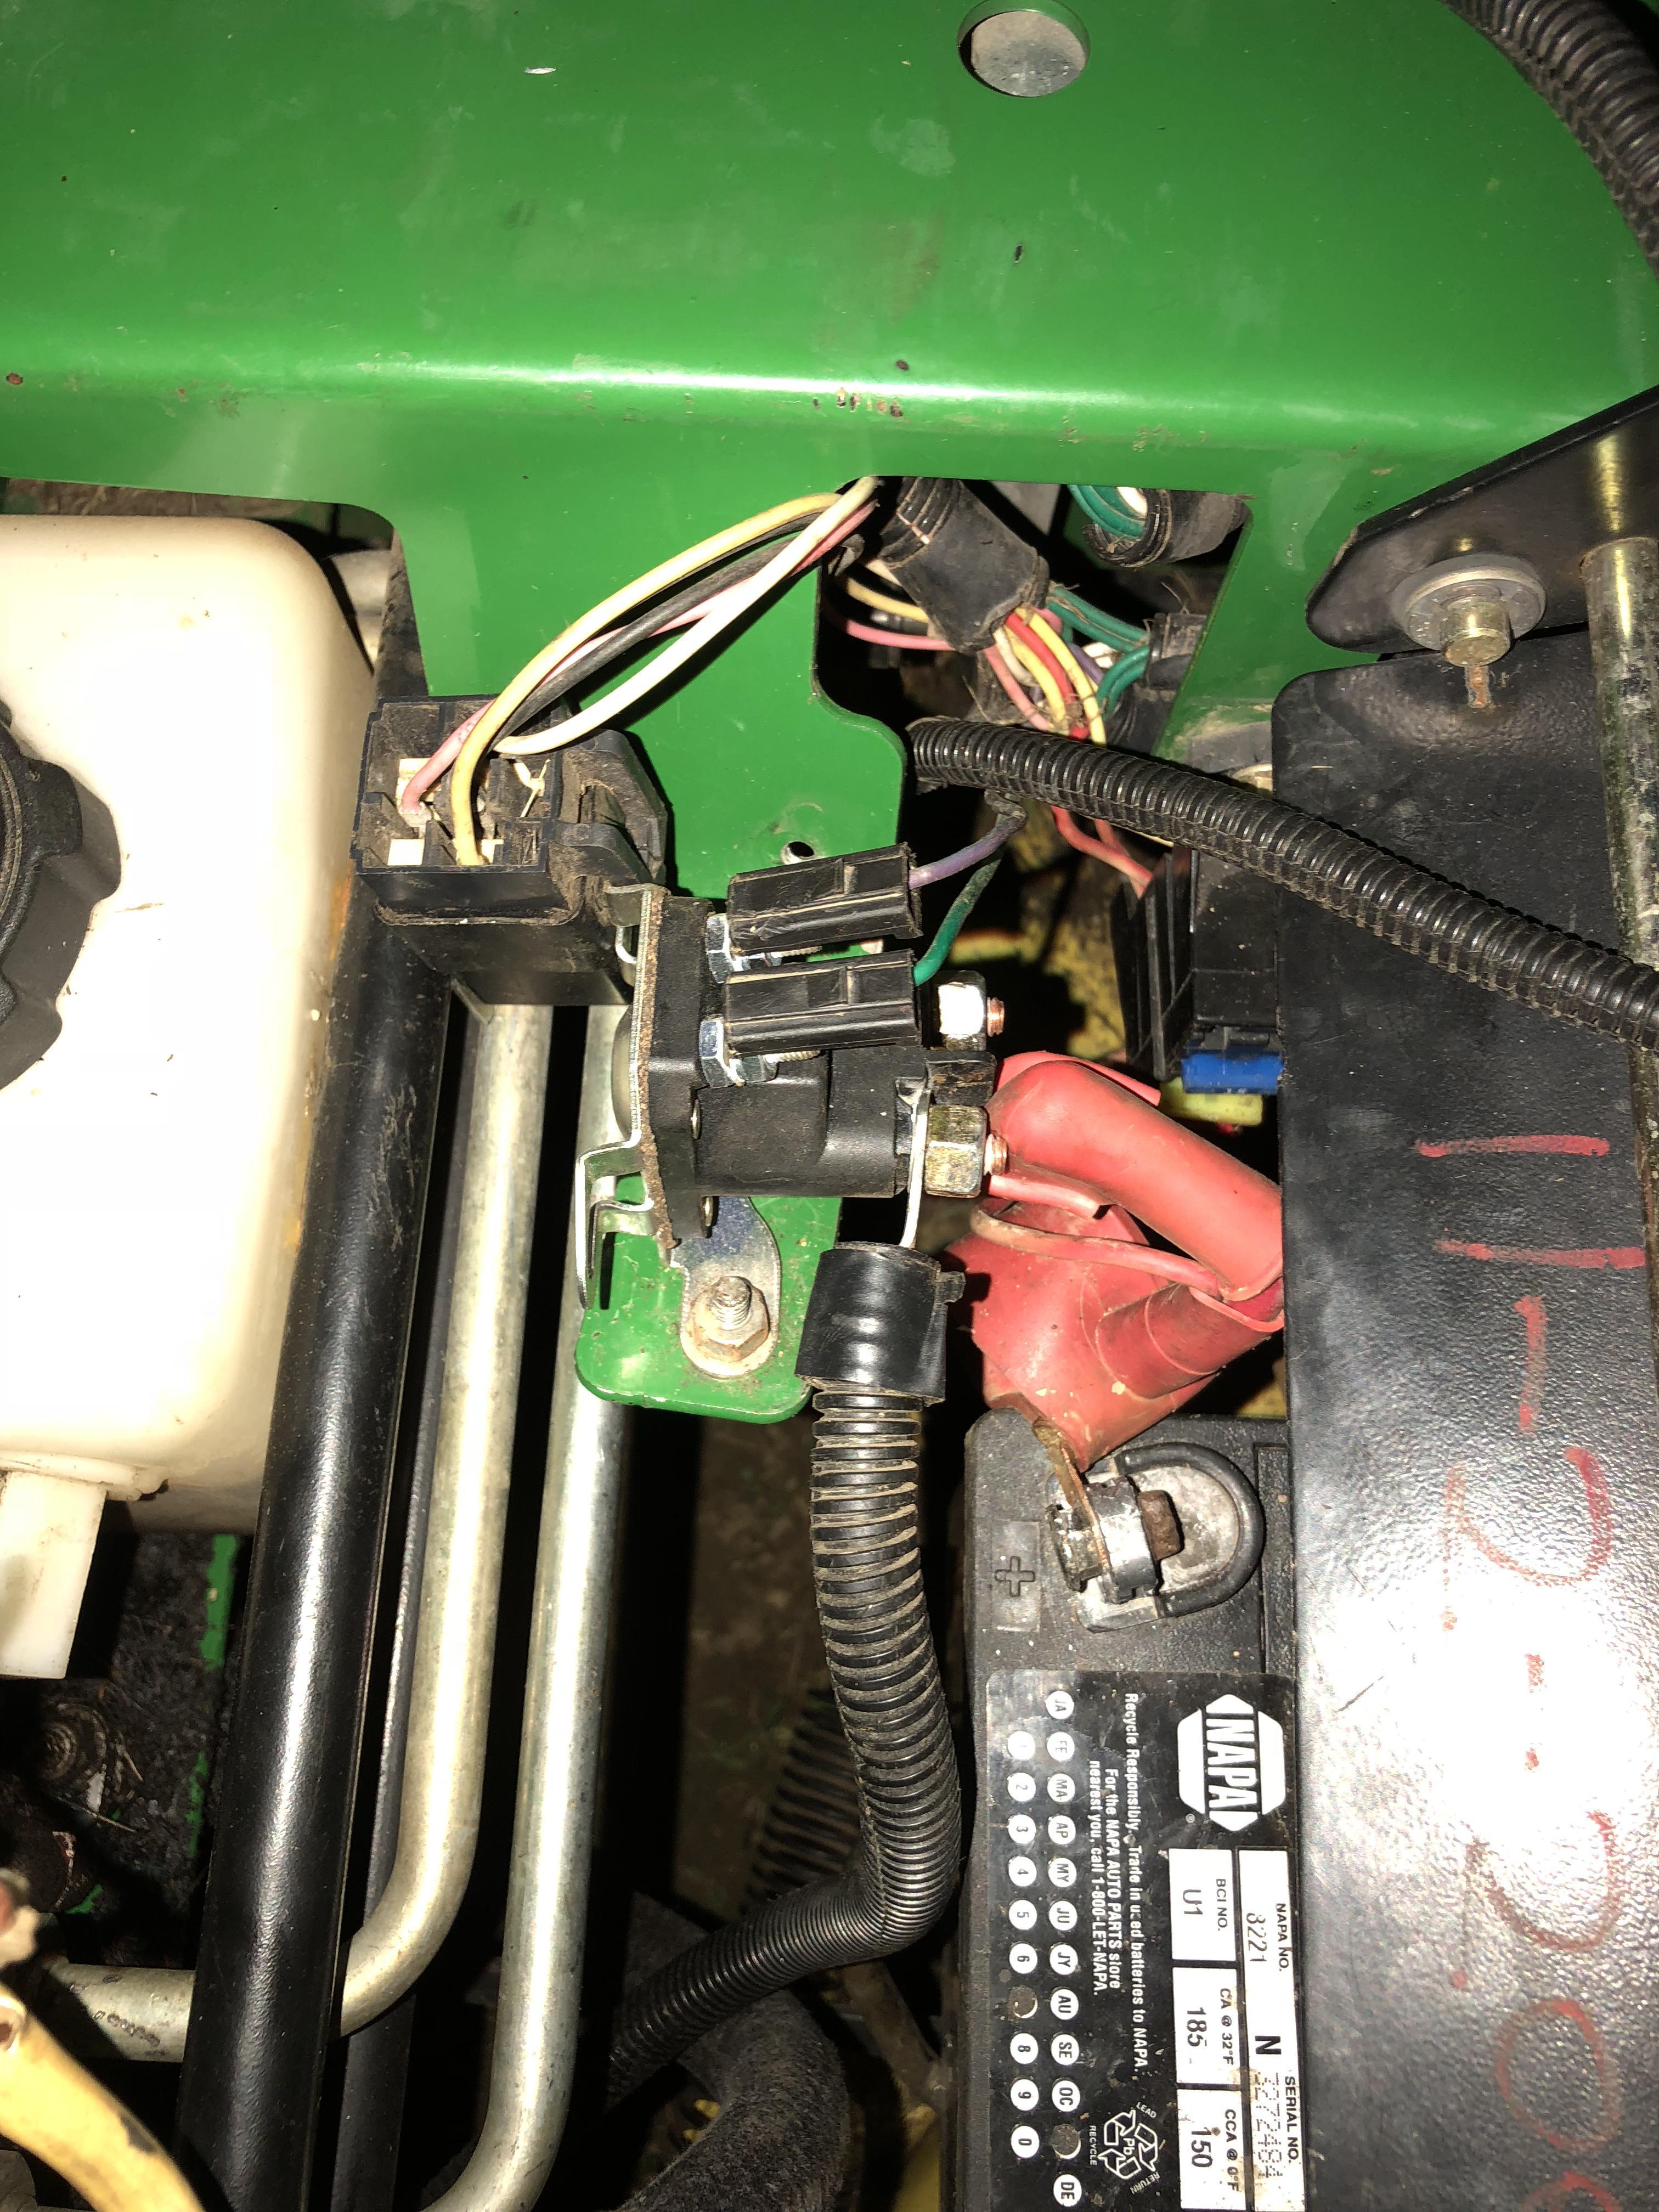 g100 john deere wiring diagram, z225 john deere wiring diagram, x465 john deere wiring diagram, g110 john deere wiring diagram, la135 john deere wiring diagram, stx38 john deere wiring diagram, lx178 john deere wiring diagram, l120 john deere wiring diagram, l110 john deere wiring diagram, x485 john deere wiring diagram, z425 john deere wiring diagram, on john deere z445 wiring diagram